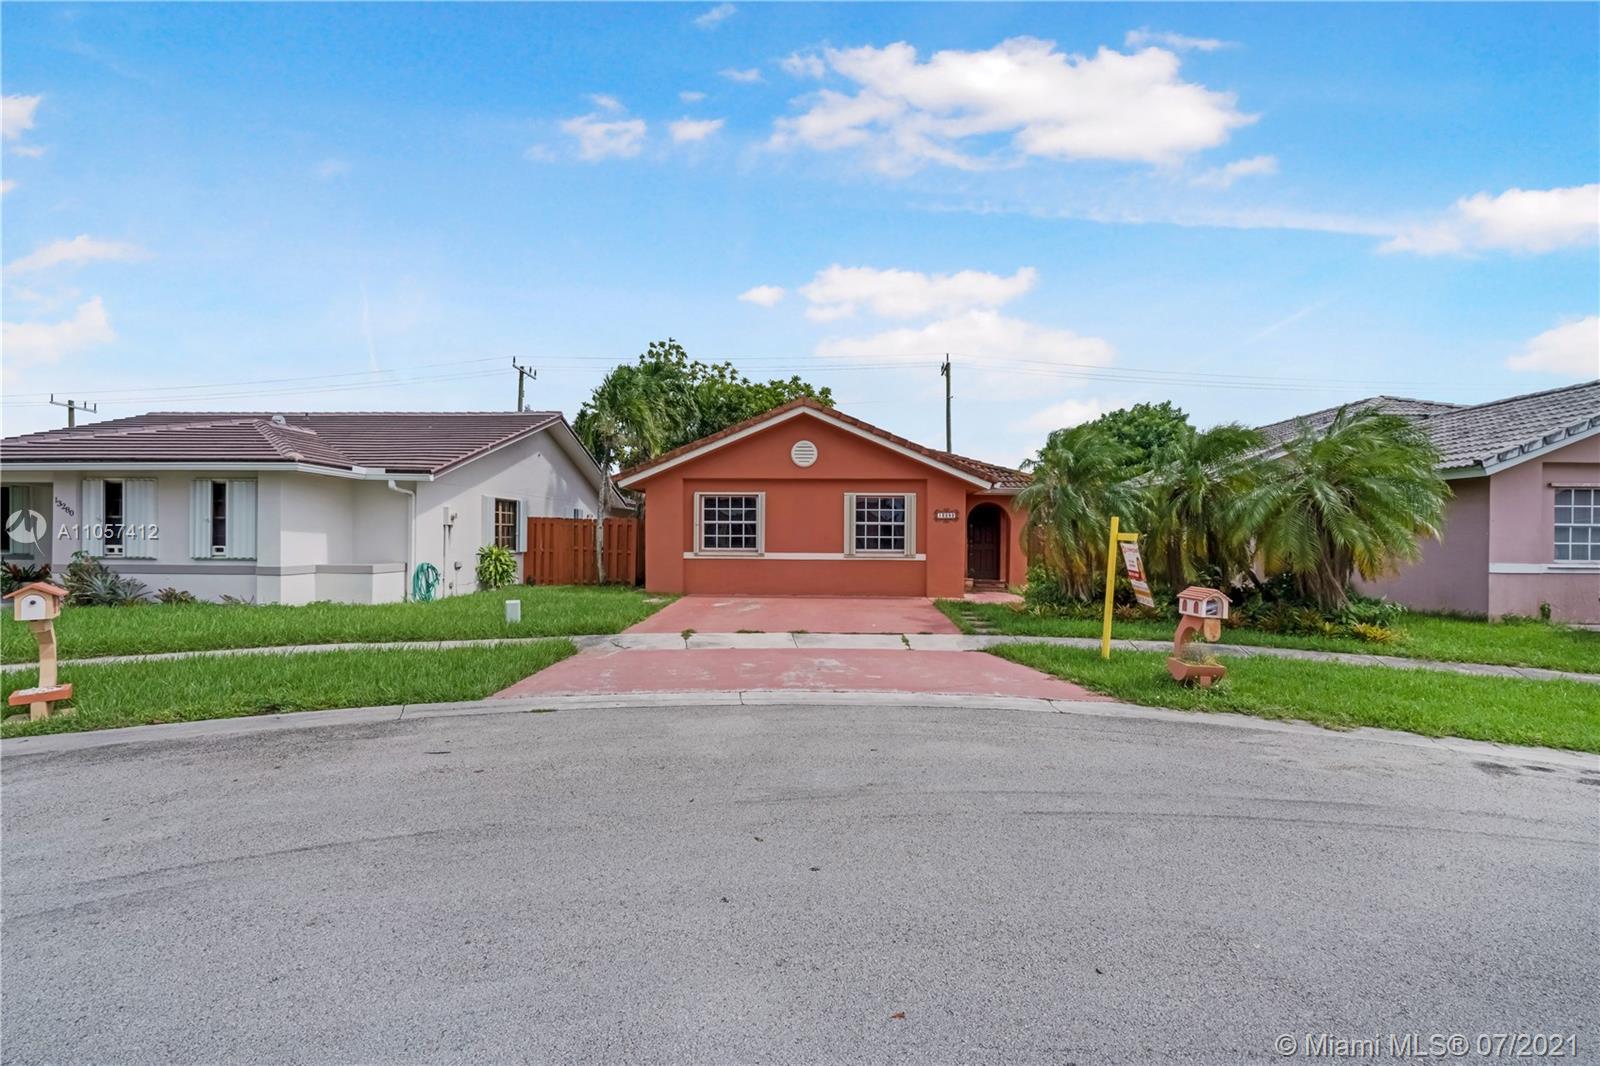 J G Heads Farms - 13282 SW 40th Ter, Miami, FL 33175